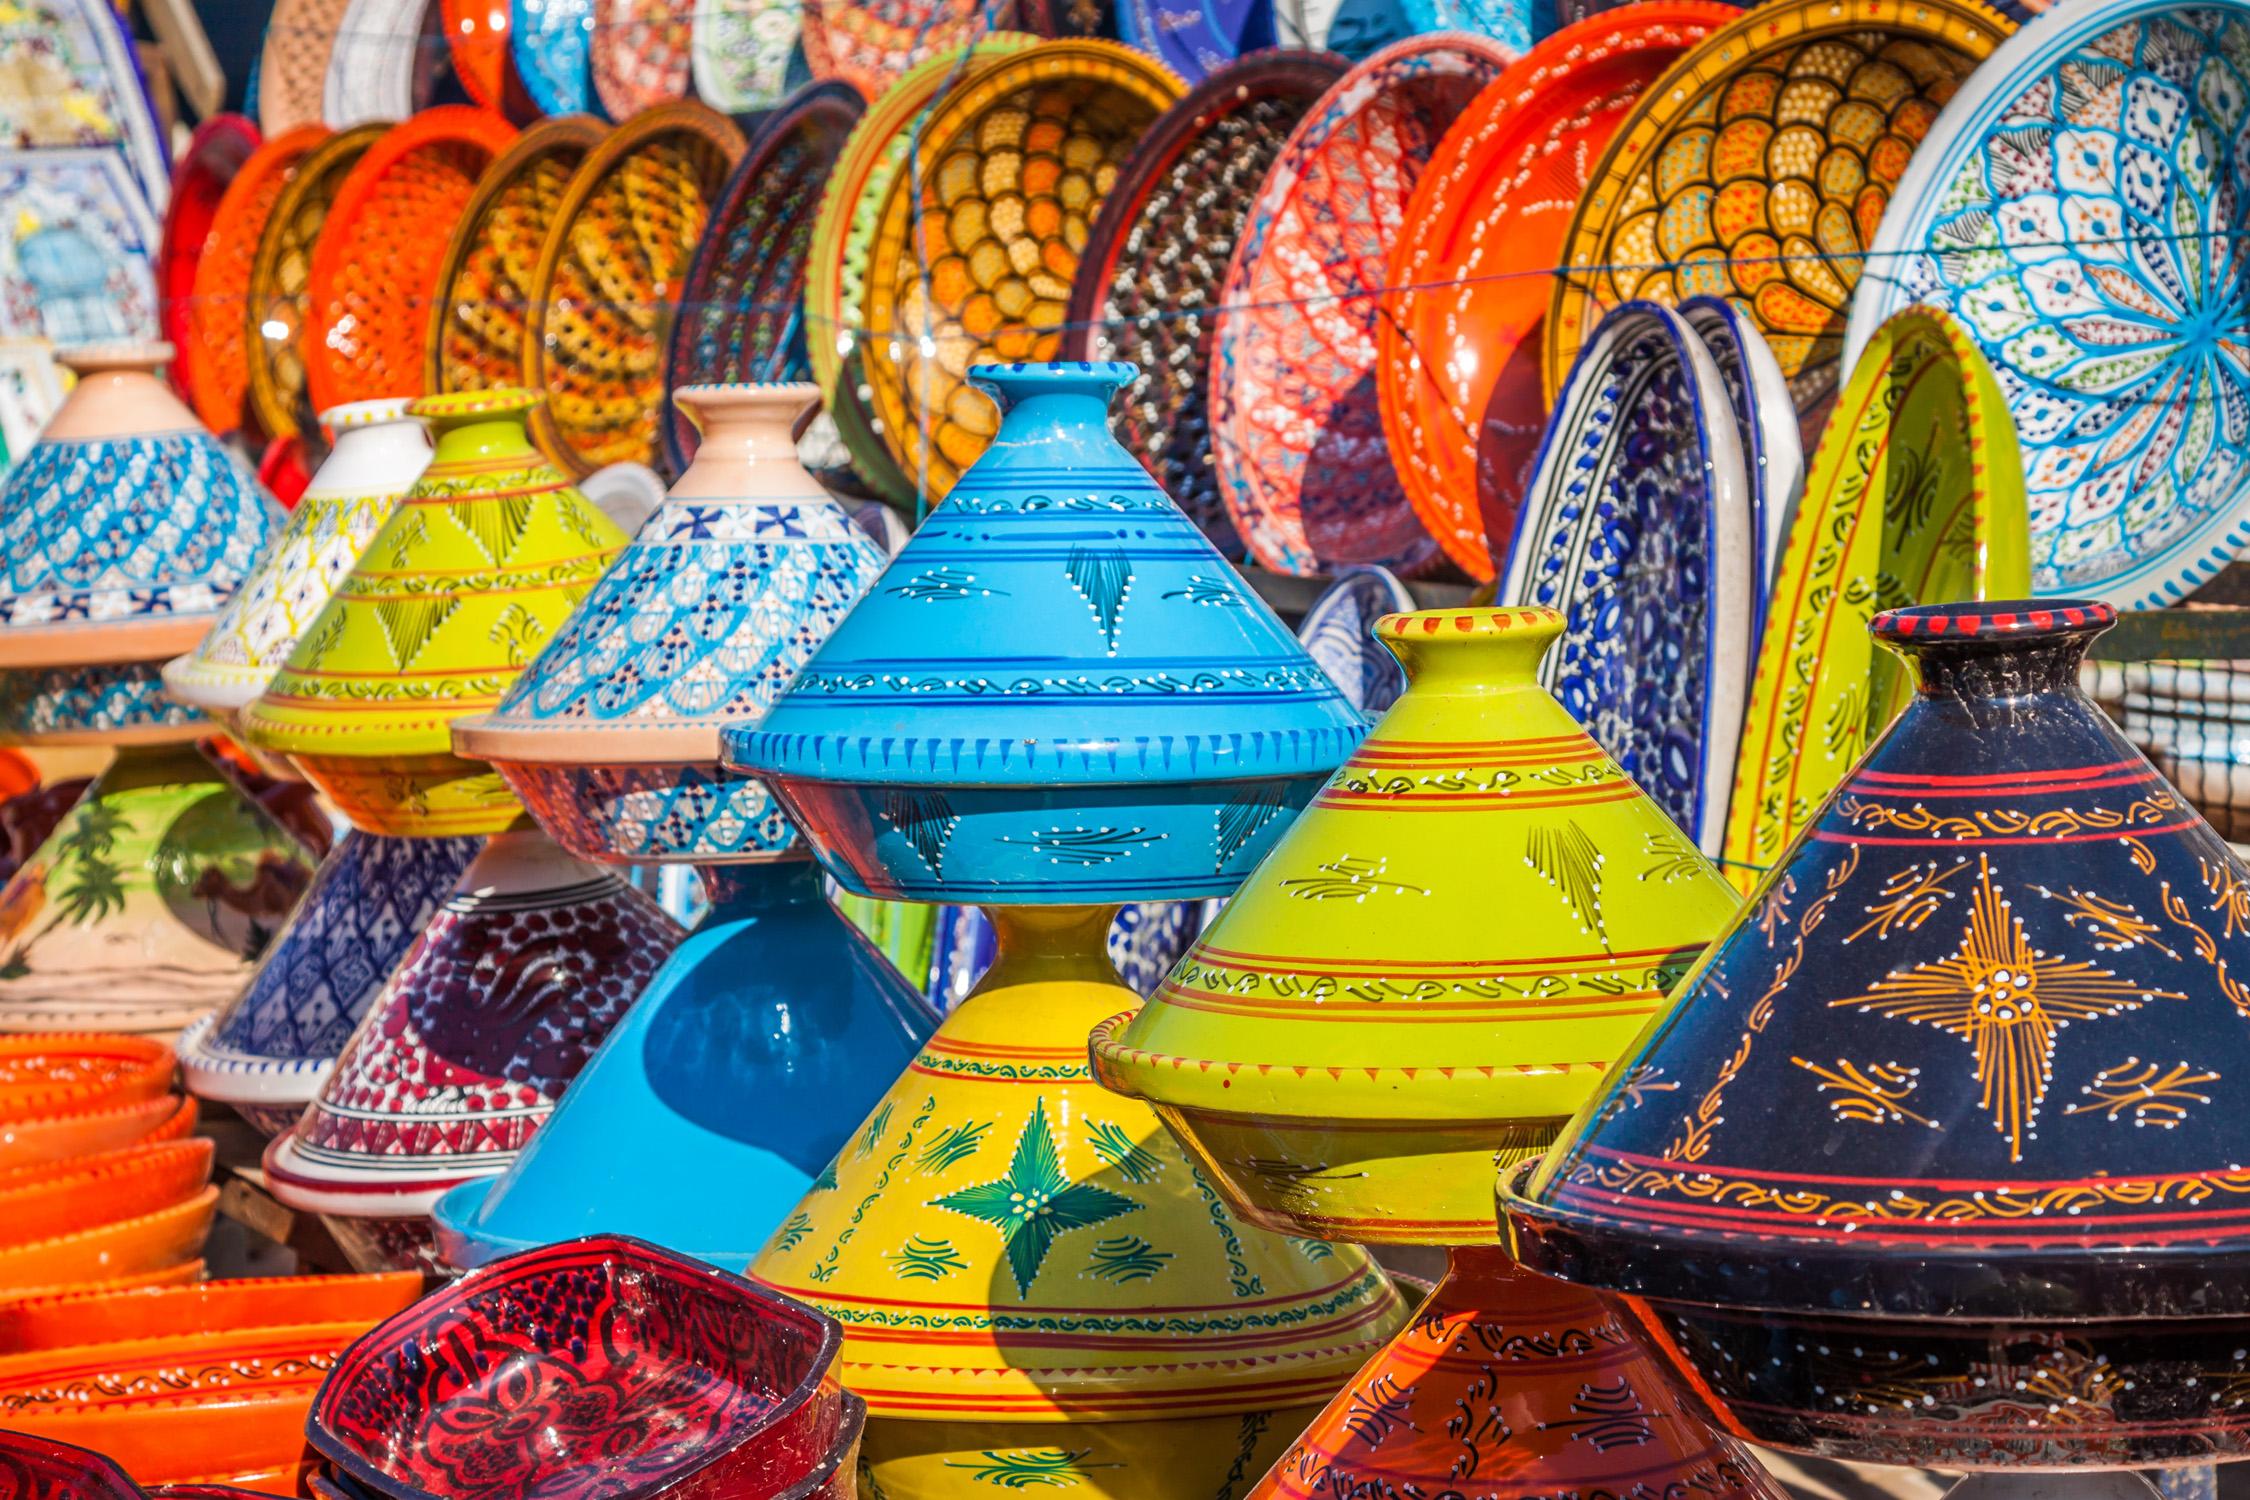 Marokko 7 Tage Agadir Im 4 Hotel Mit All Inclusive Flug Transfer